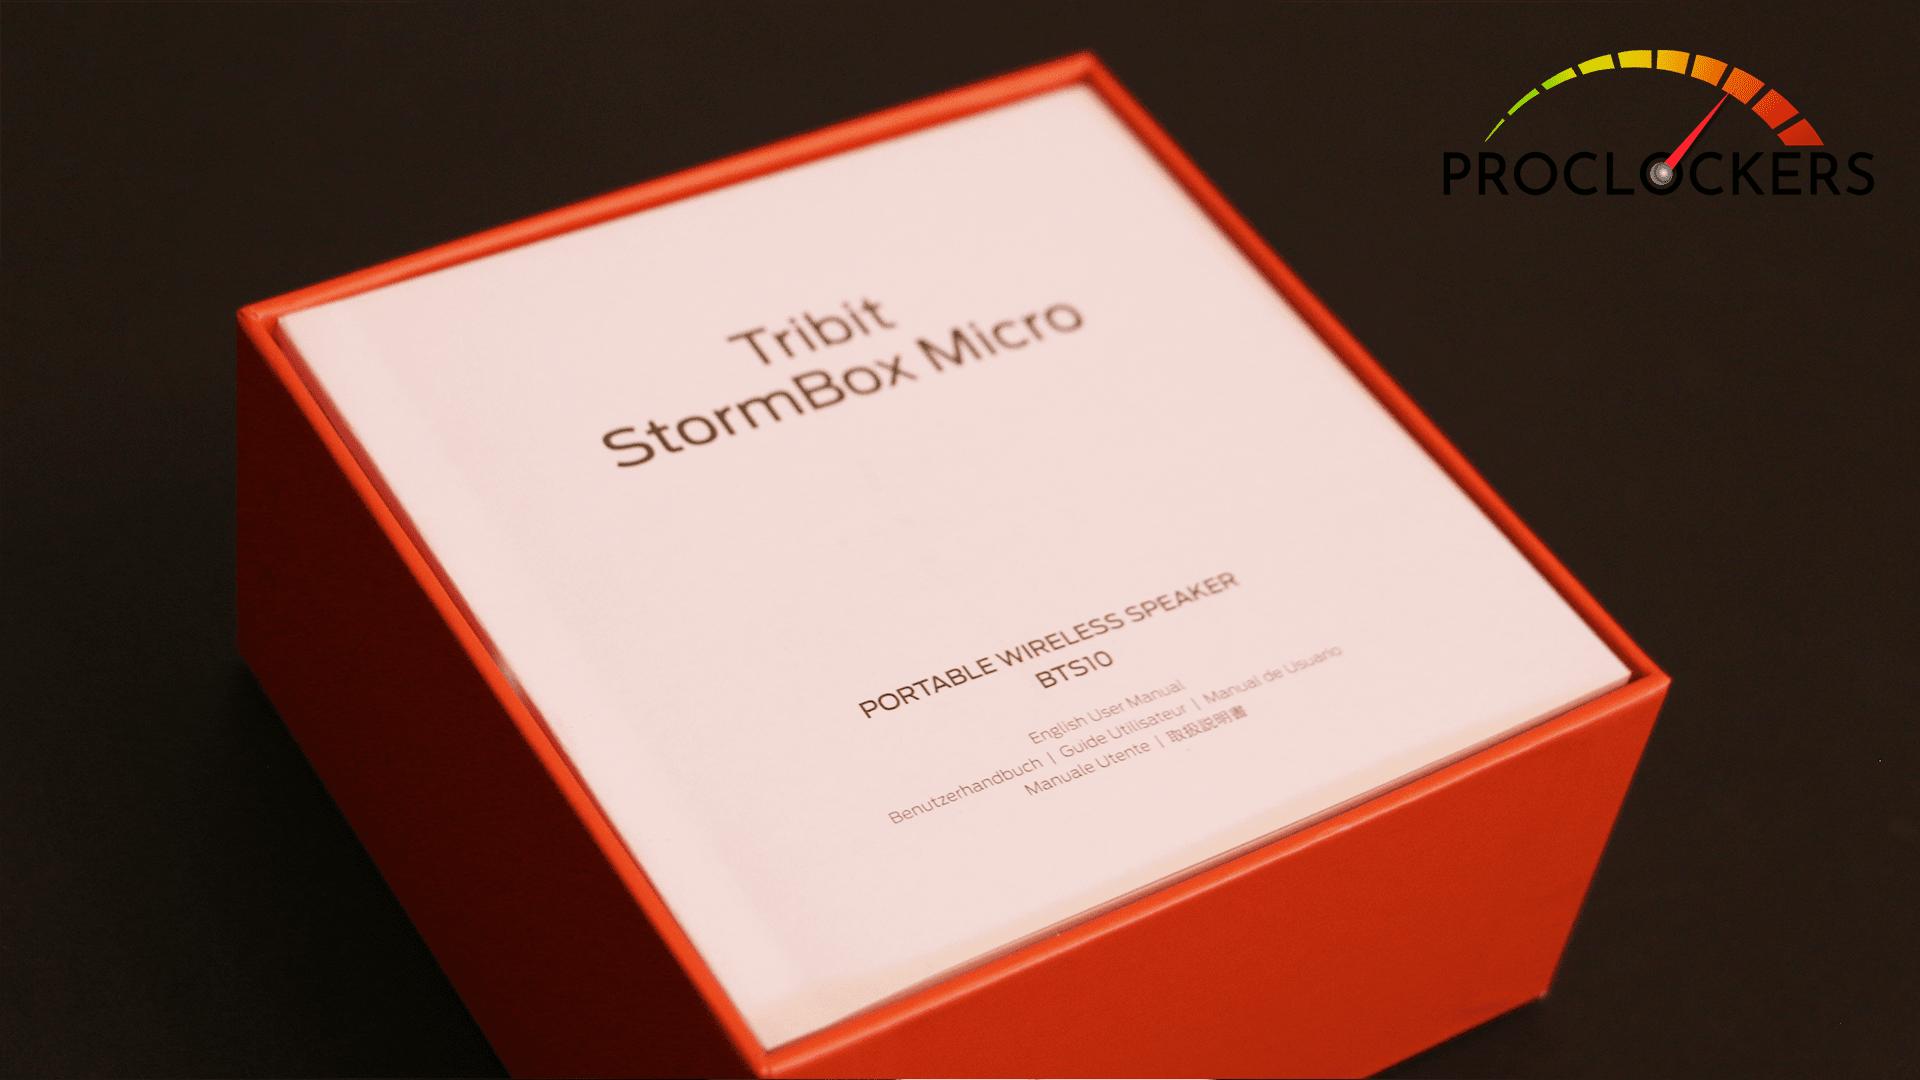 TRIBIT STORMBOX MICRO MANUAL